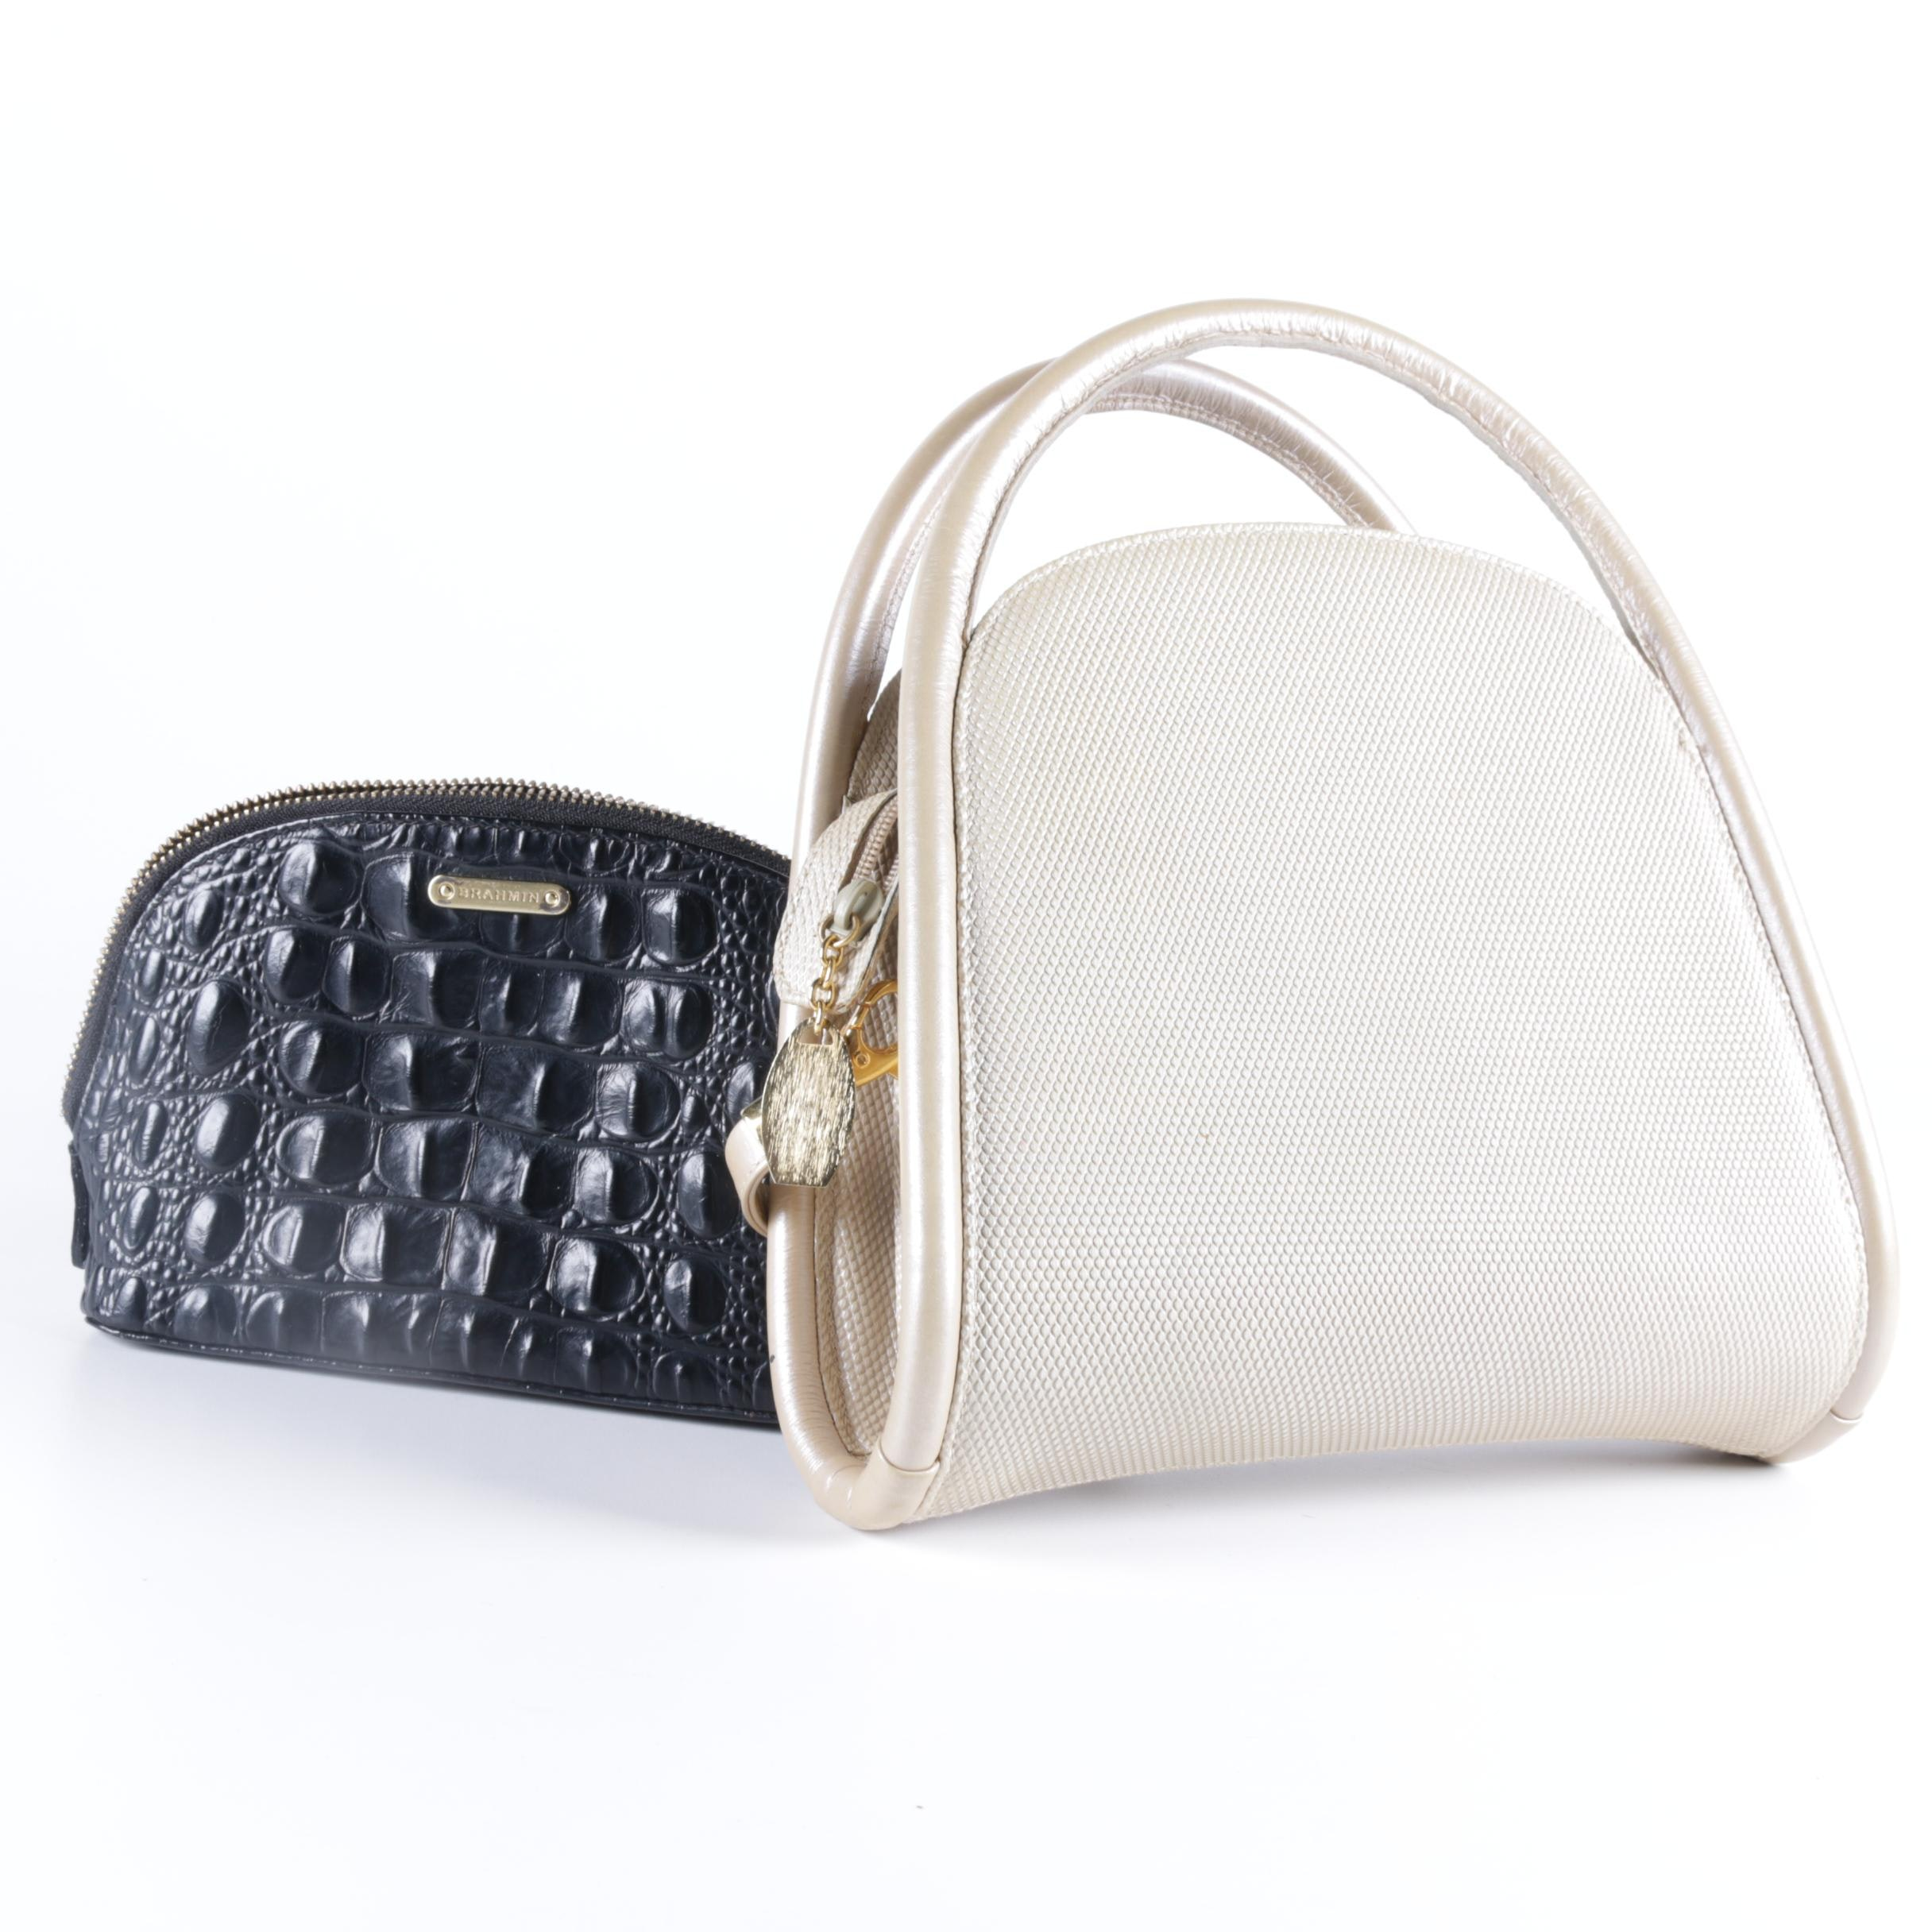 Brahmin and Stuart Weitzman Leather Handbags